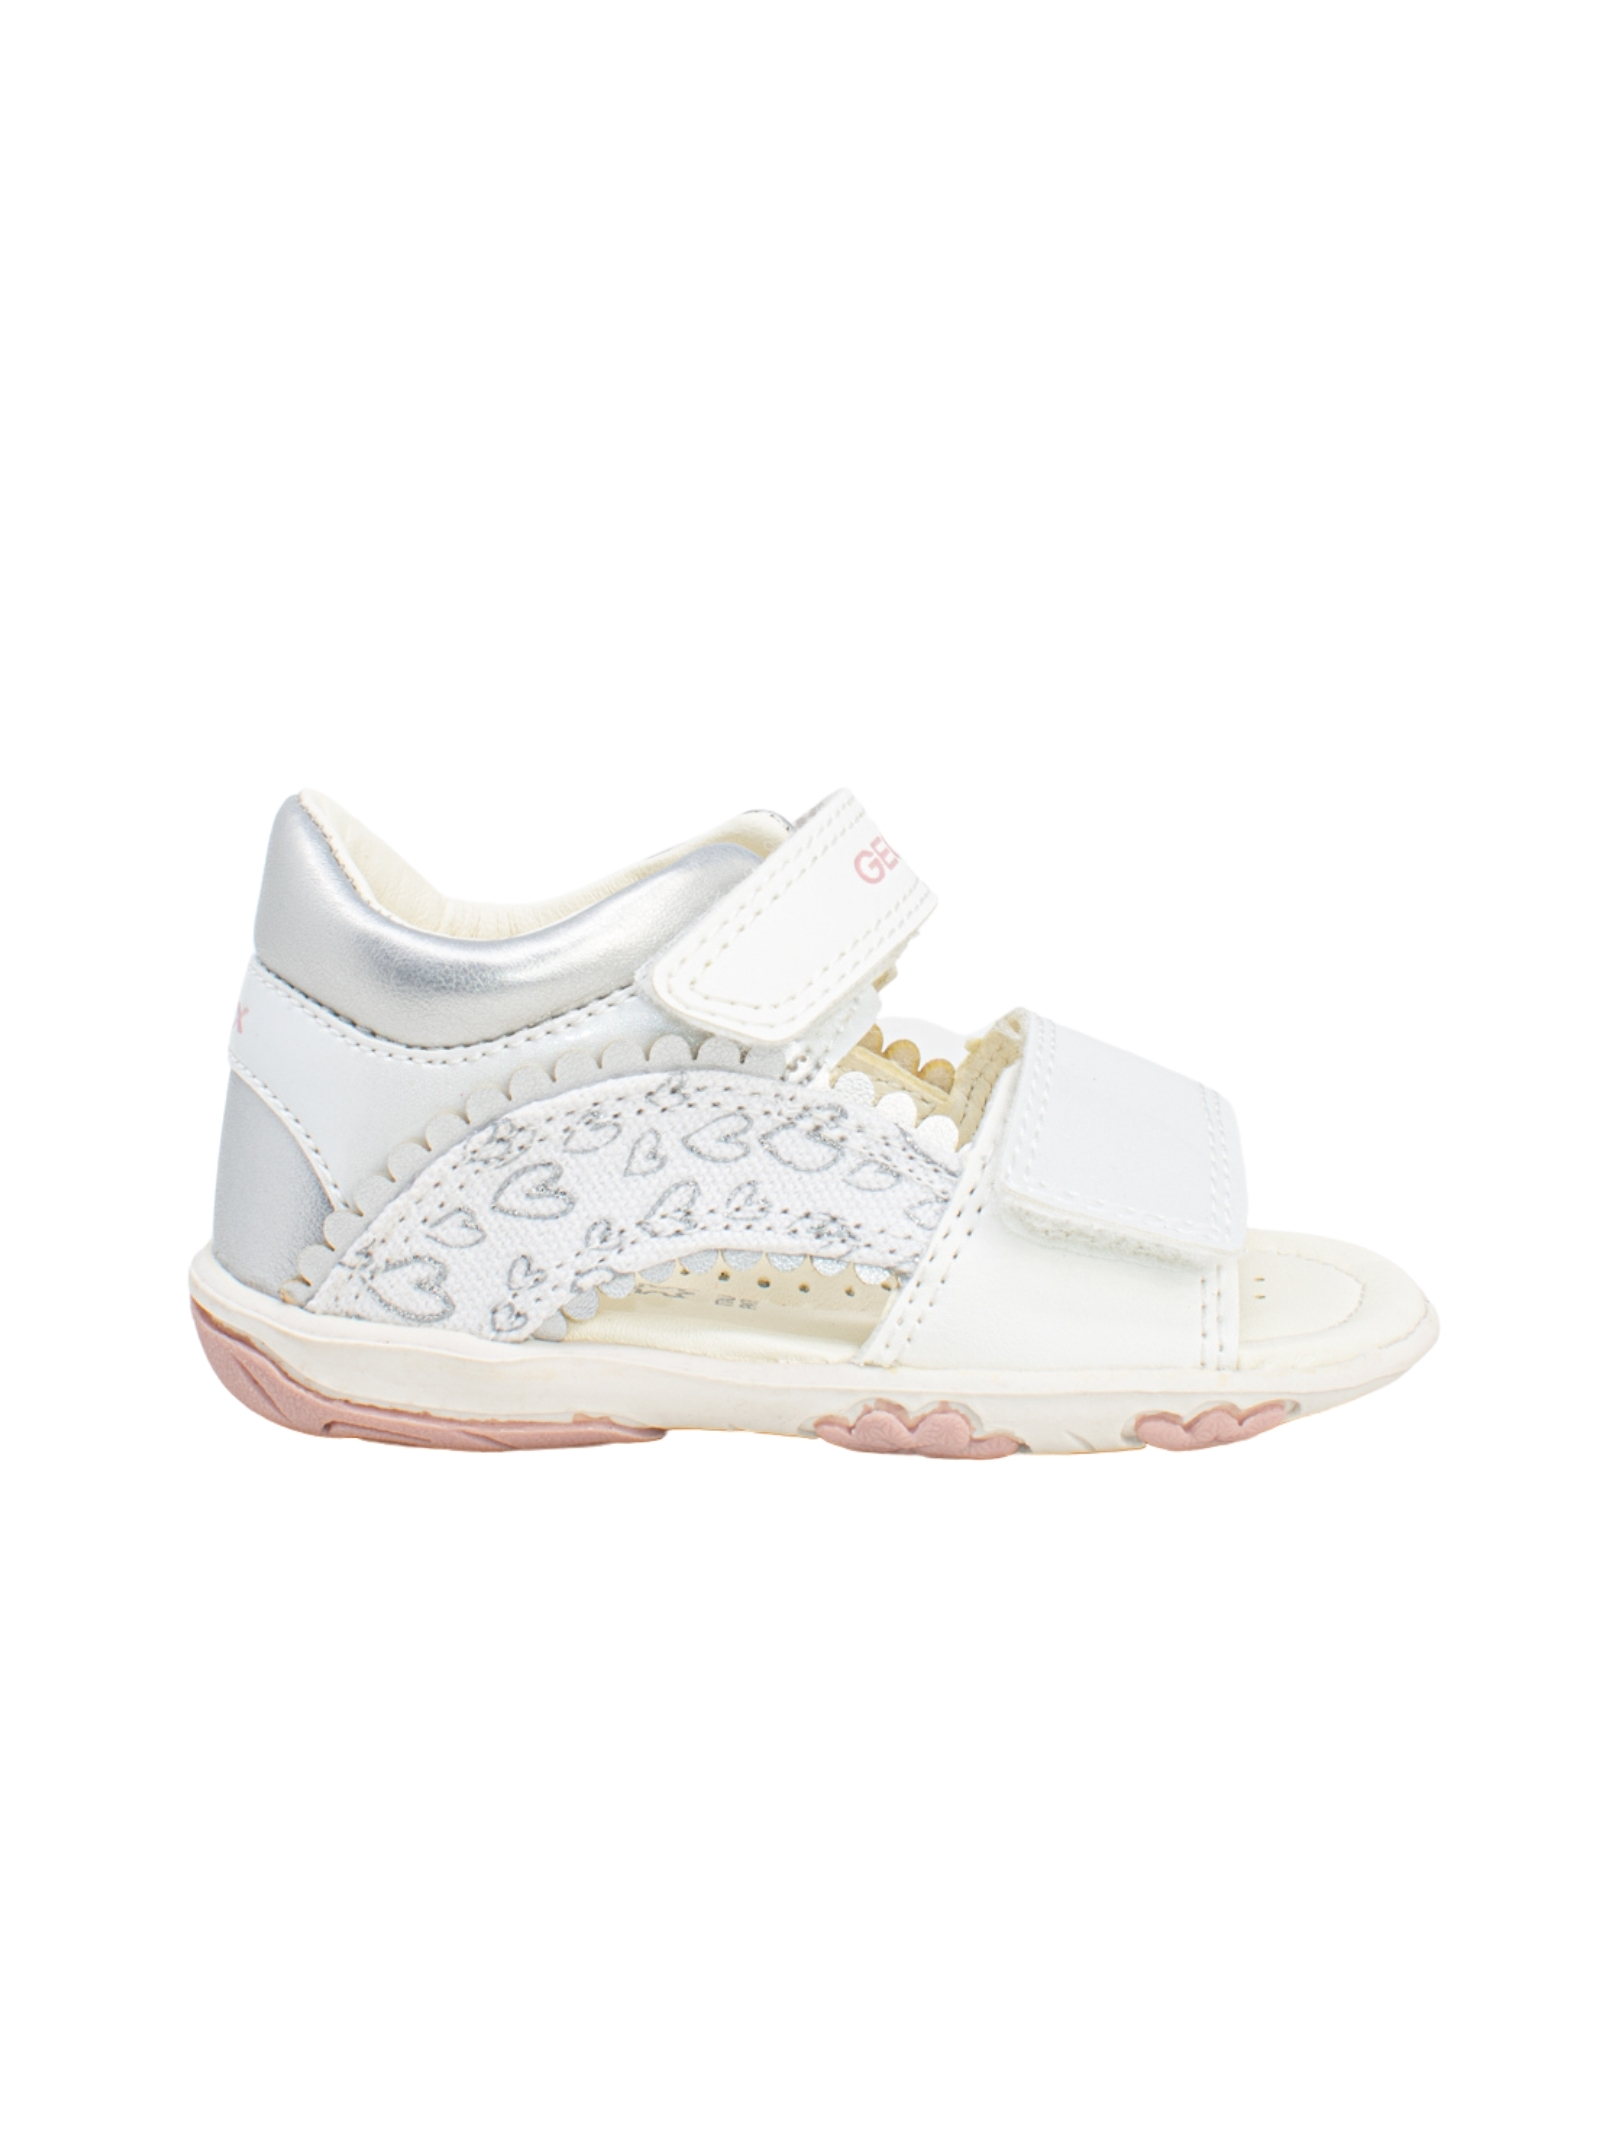 Sandalo Bambina Nicely GEOX KIDS | Sandali | B1538A010AJC0007